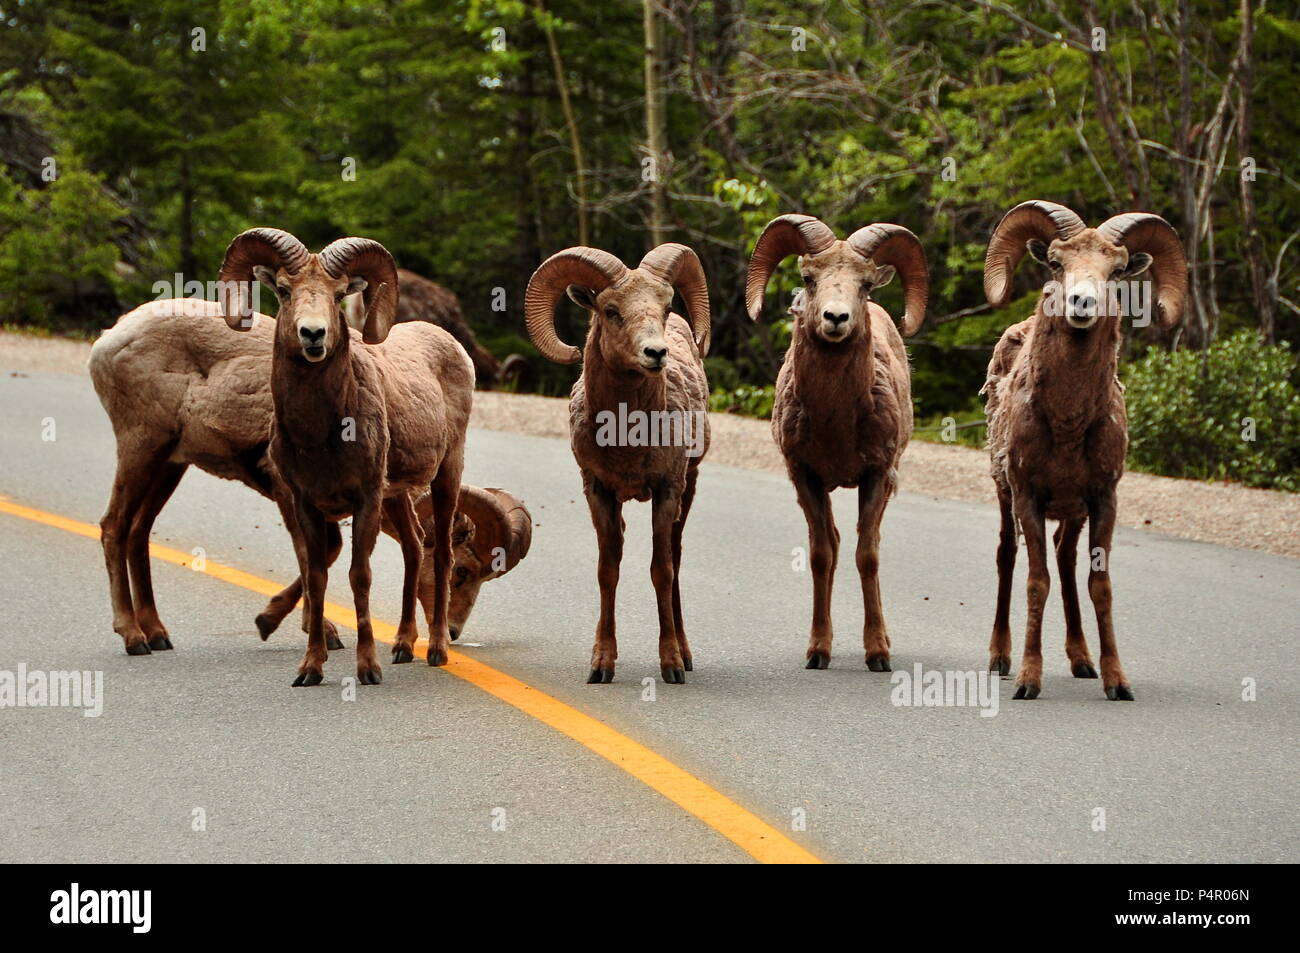 Big Horned Sheep - Stock Image